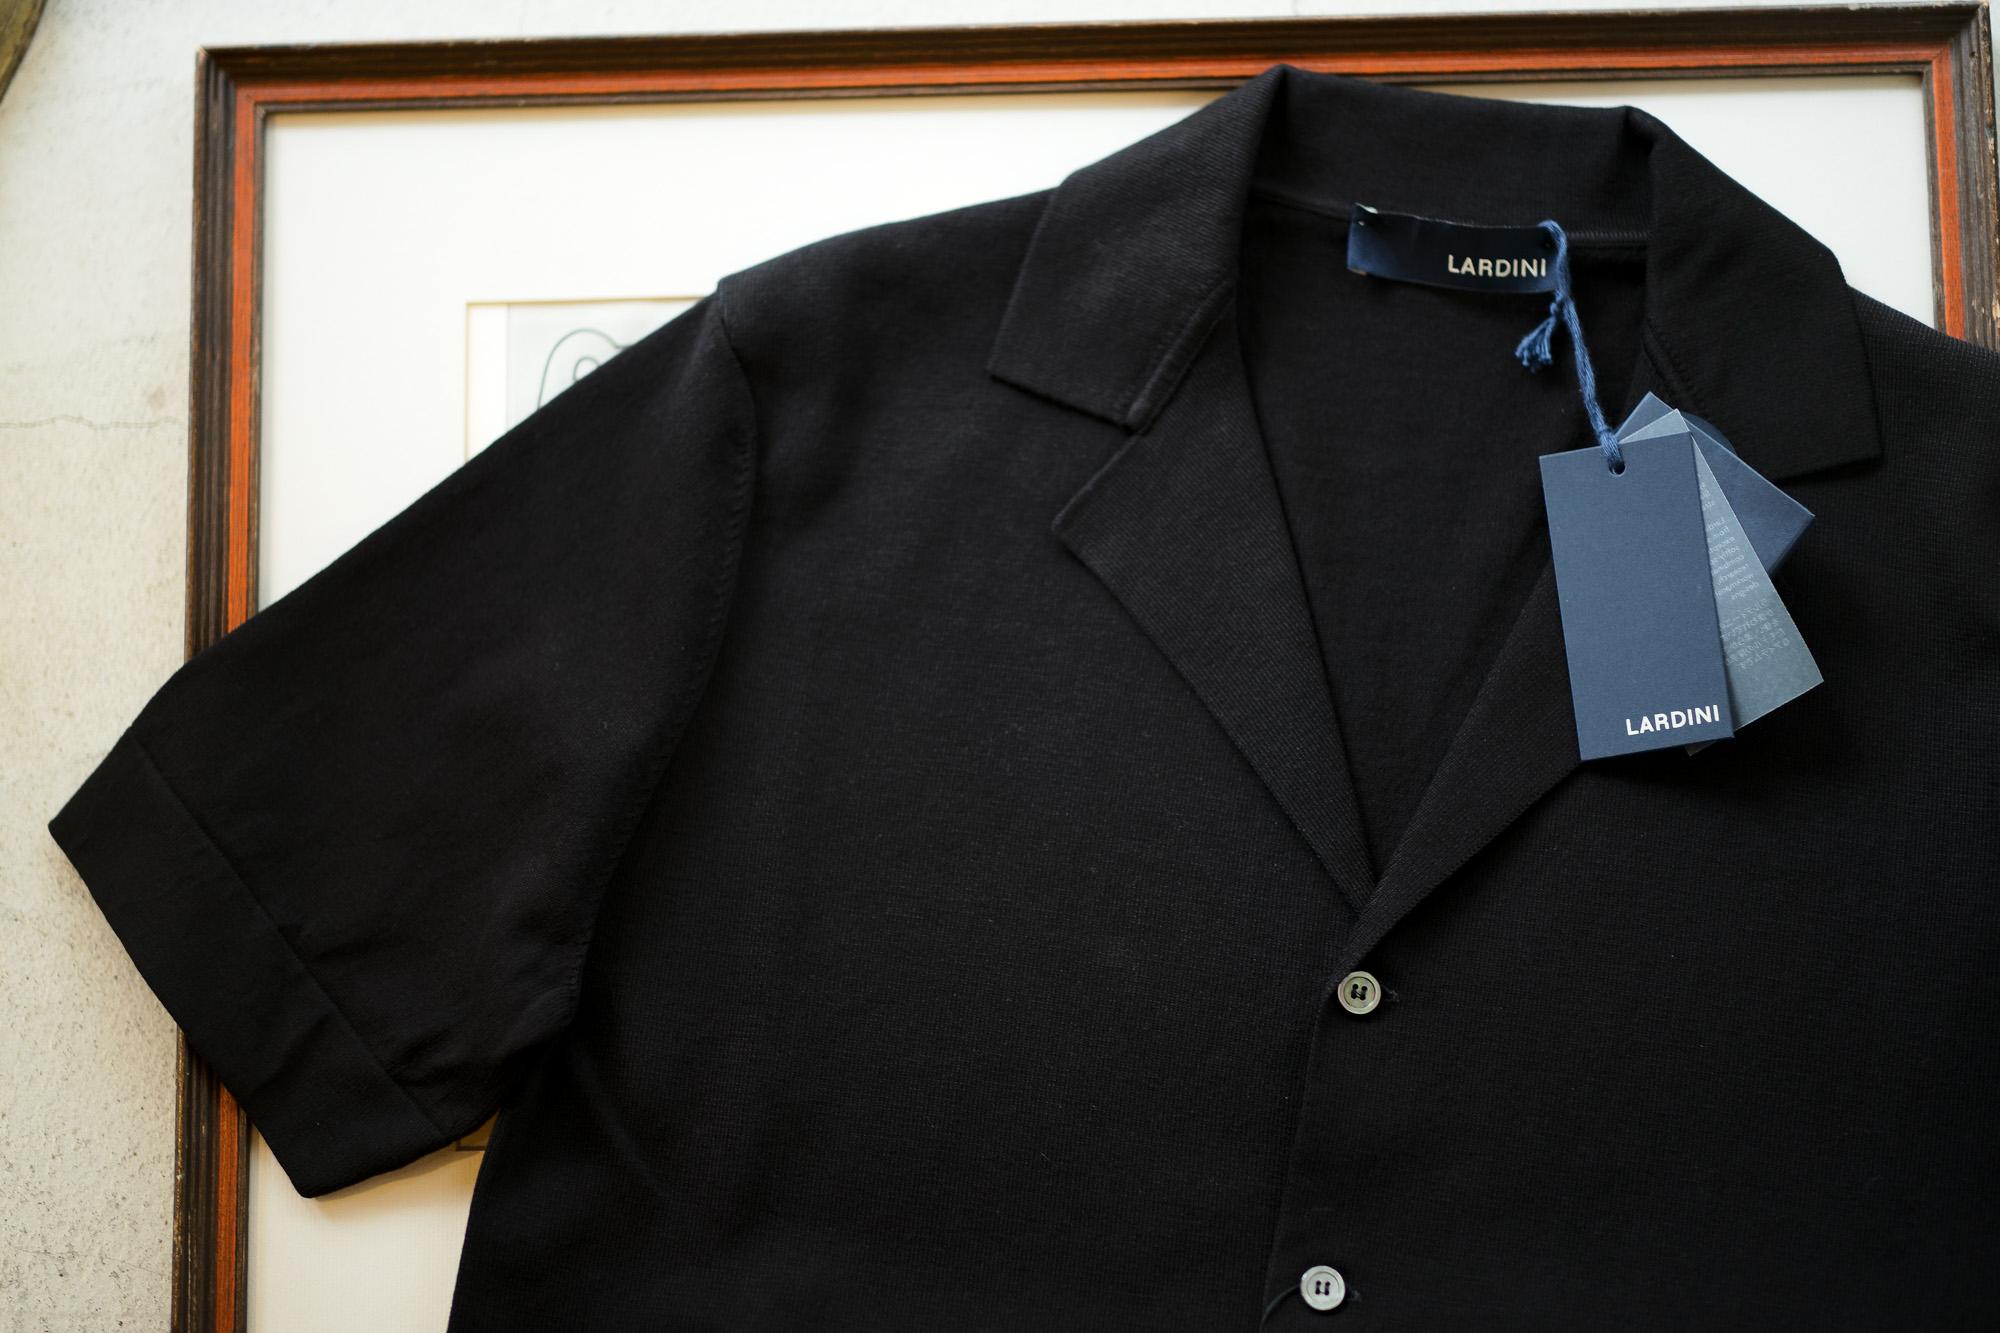 LARDINI (ラルディーニ) Milano Rib Knit Shirts (ミラノリブ ニット シャツ) コットン ミラノリブ オープンカラー ニット シャツ BLACK (ブラック・999) Made in italy (イタリア製) 2019 春夏新作 愛知 名古屋 altoediritto アルトエデリット